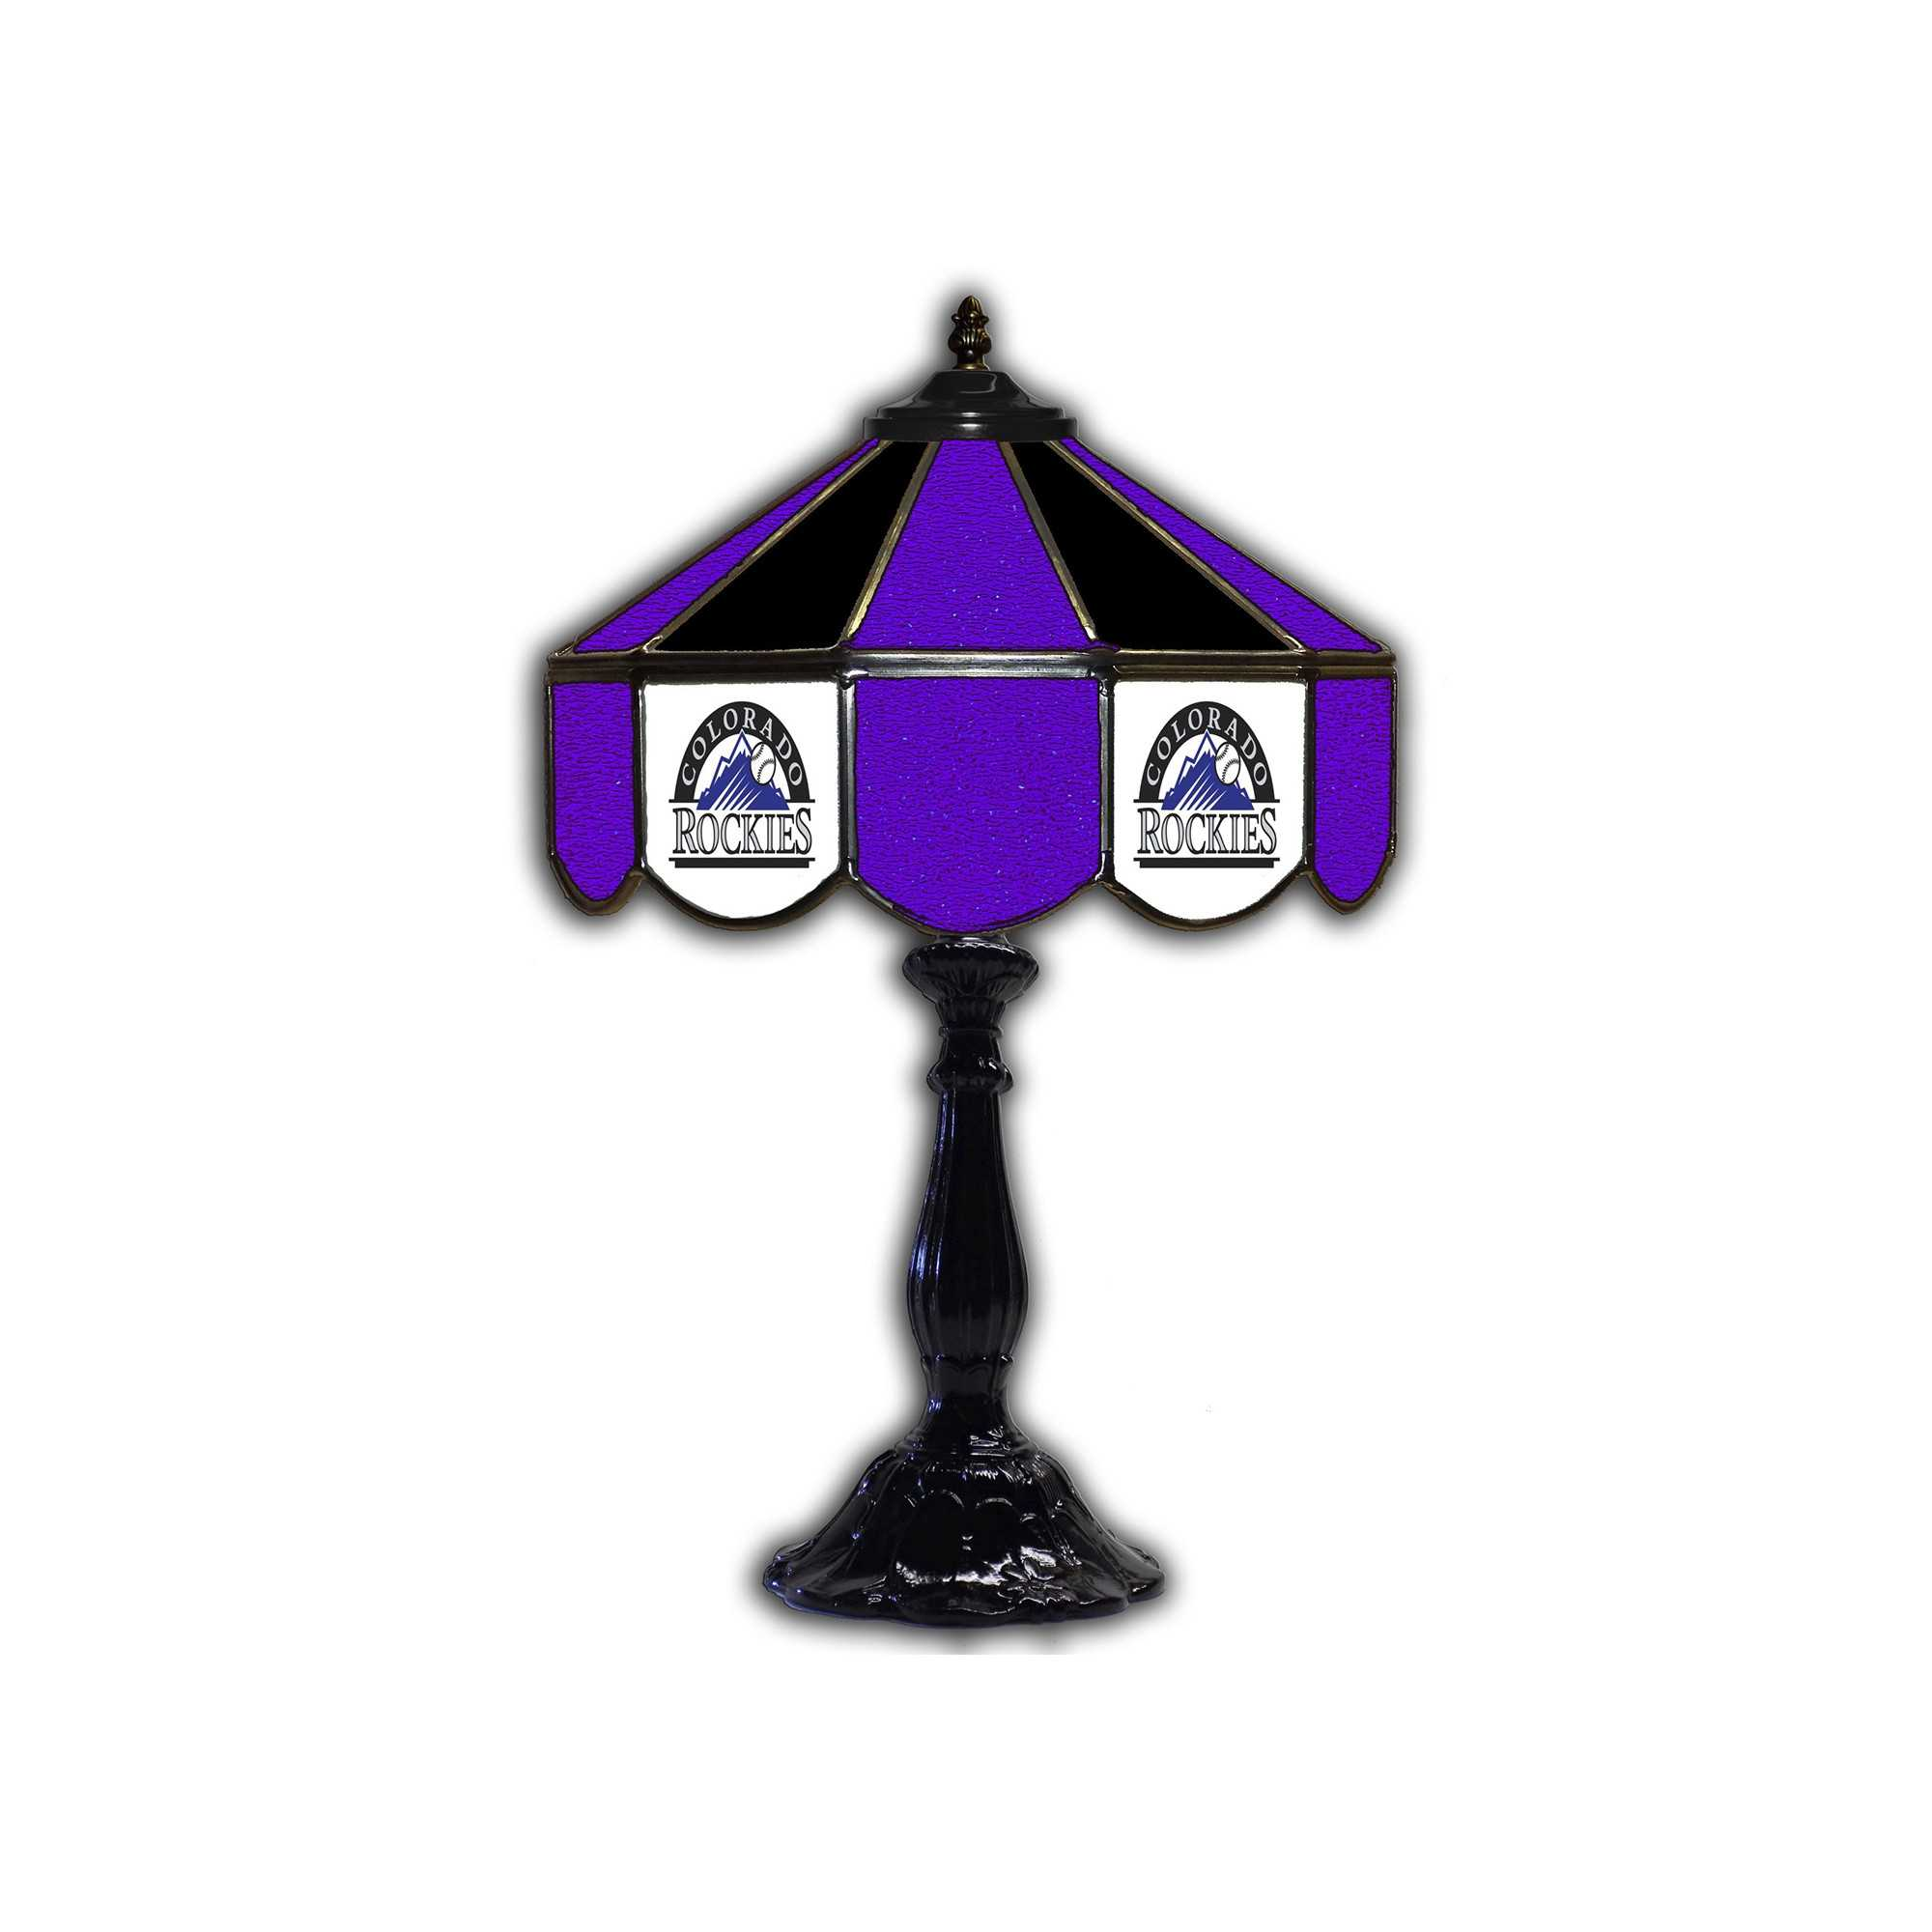 "COLORADO ROCKIES 21"" GLASS TABLE LAMP"